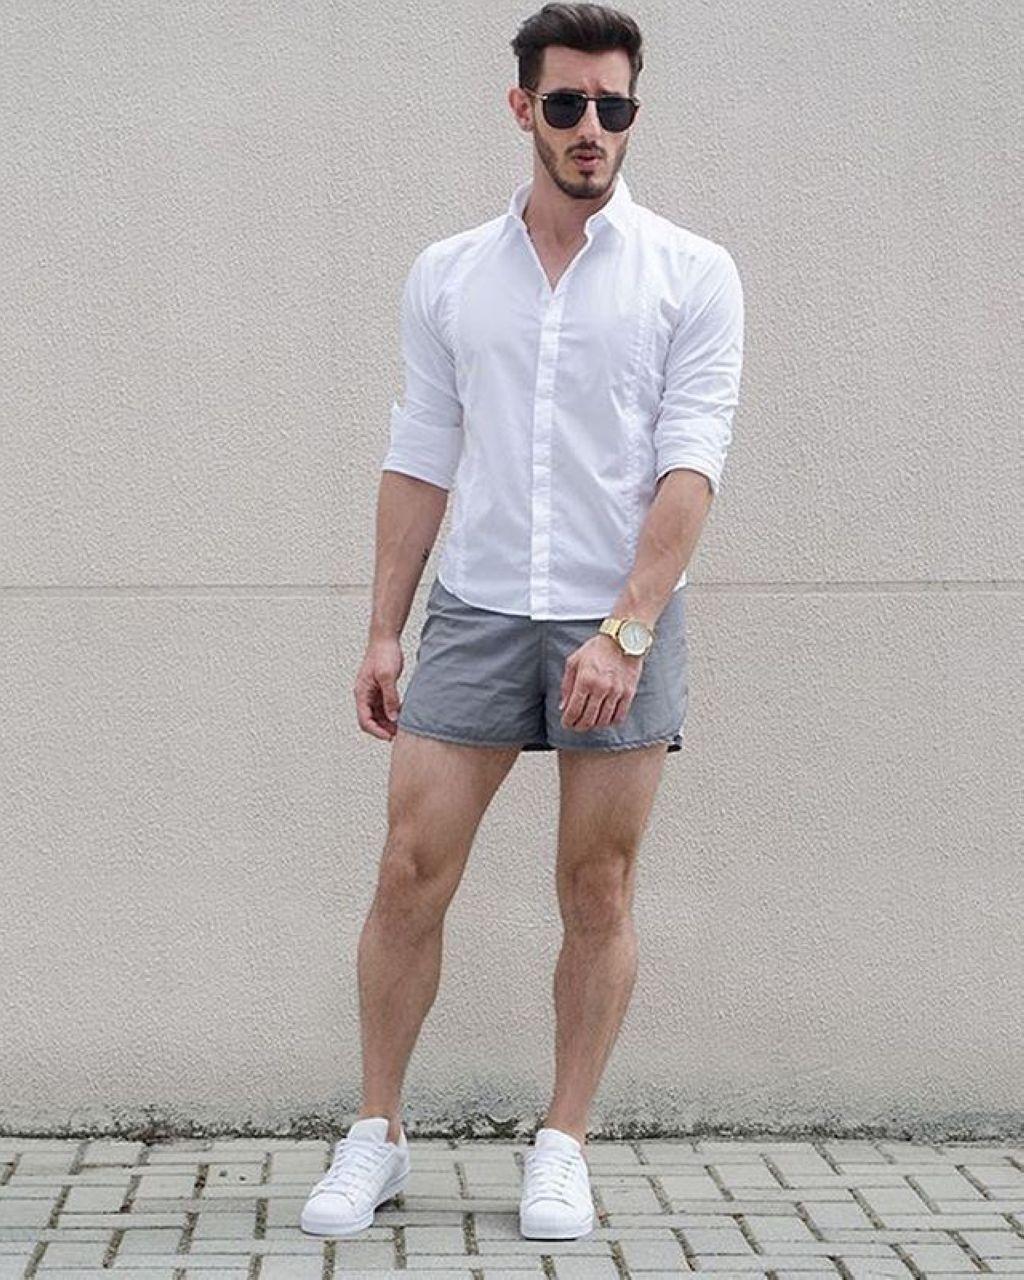 fine 44 Best Outfit for Short Men https   attirepin.com 2017 24f6ced02cf35